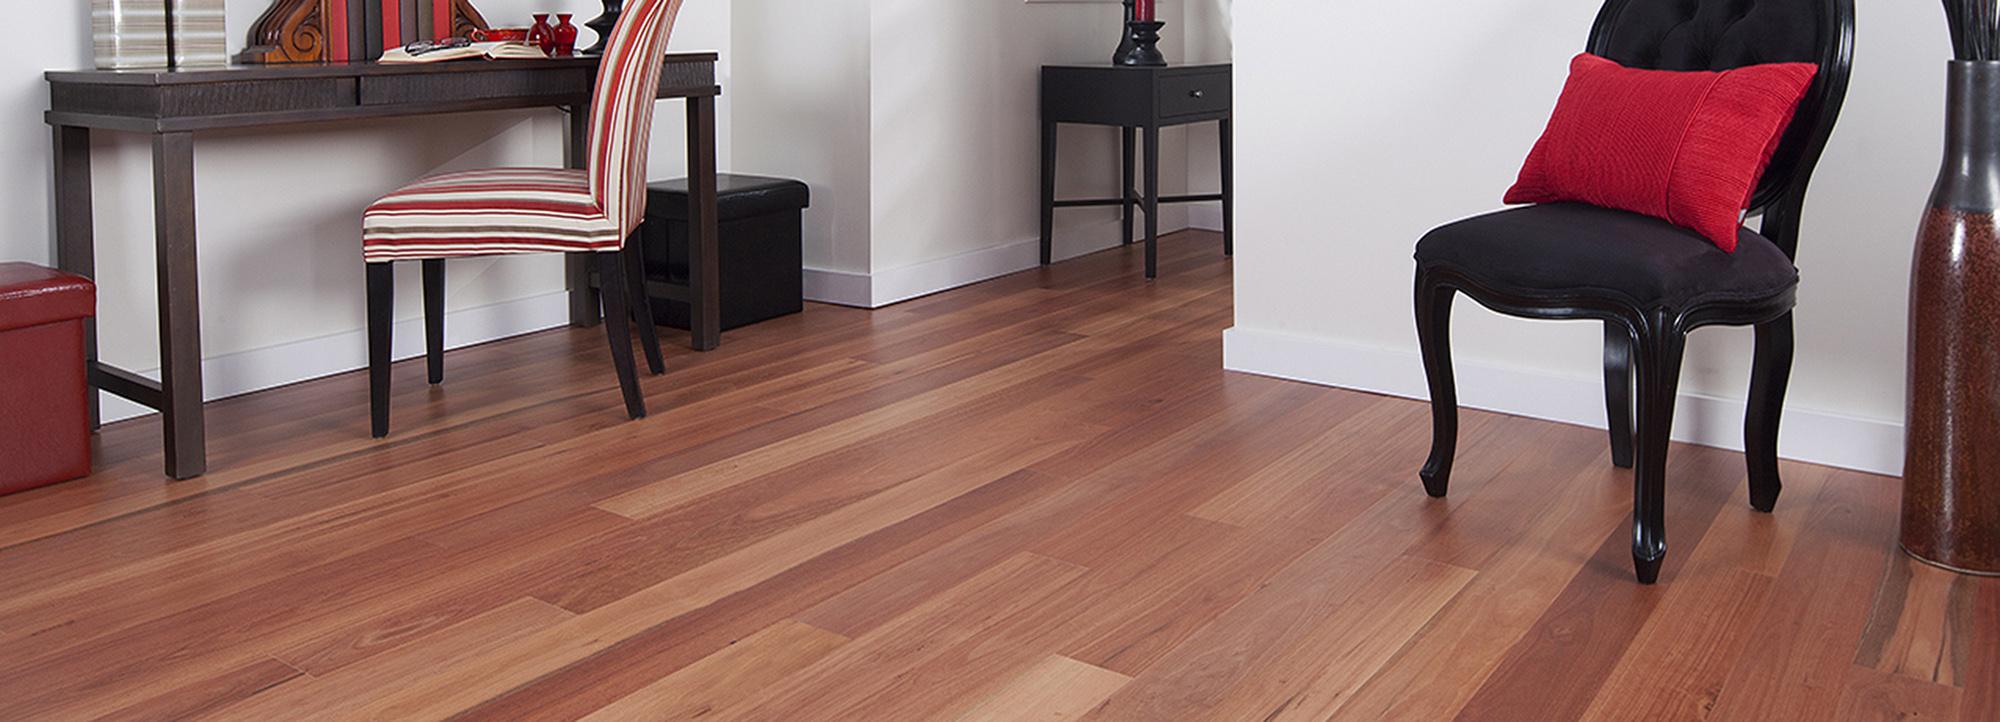 Wooden Floorboards Repairs Melbourne Carpet Vidalondon